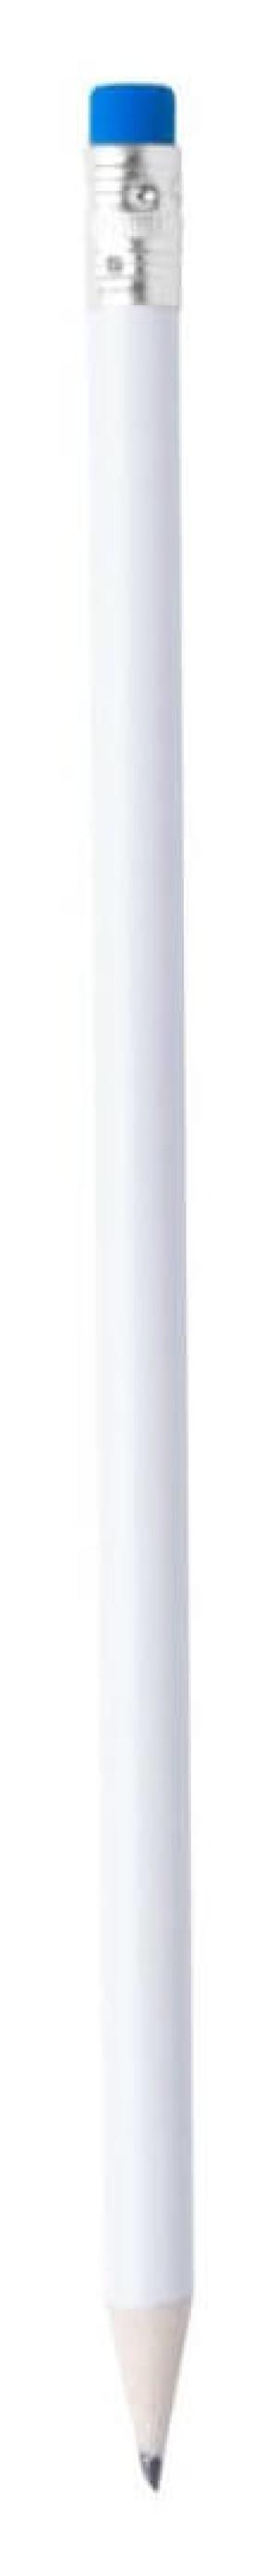 Naftár ceruzka